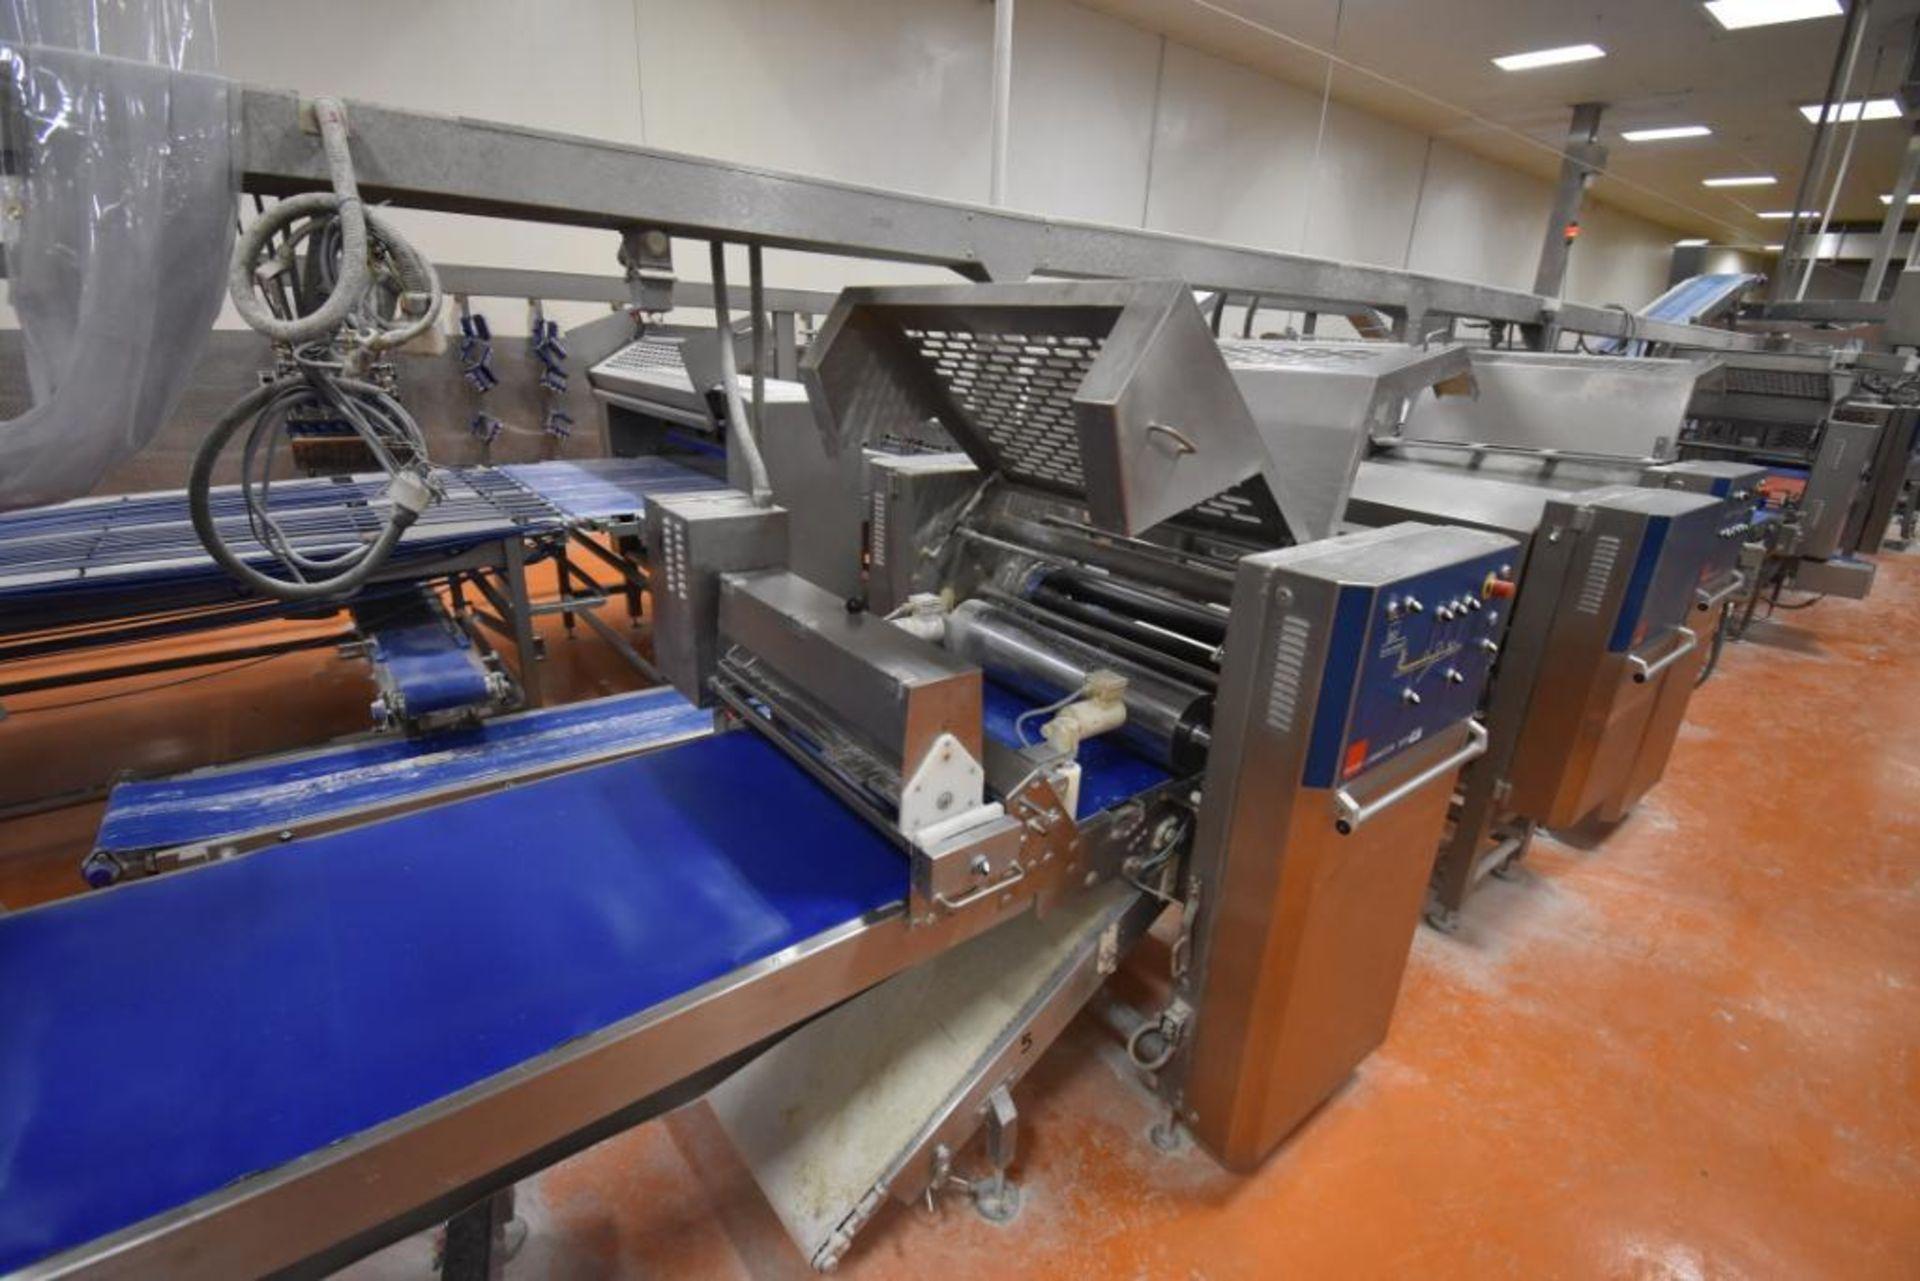 2007 Fritsch Laminator 3000 dough line - Image 257 of 280